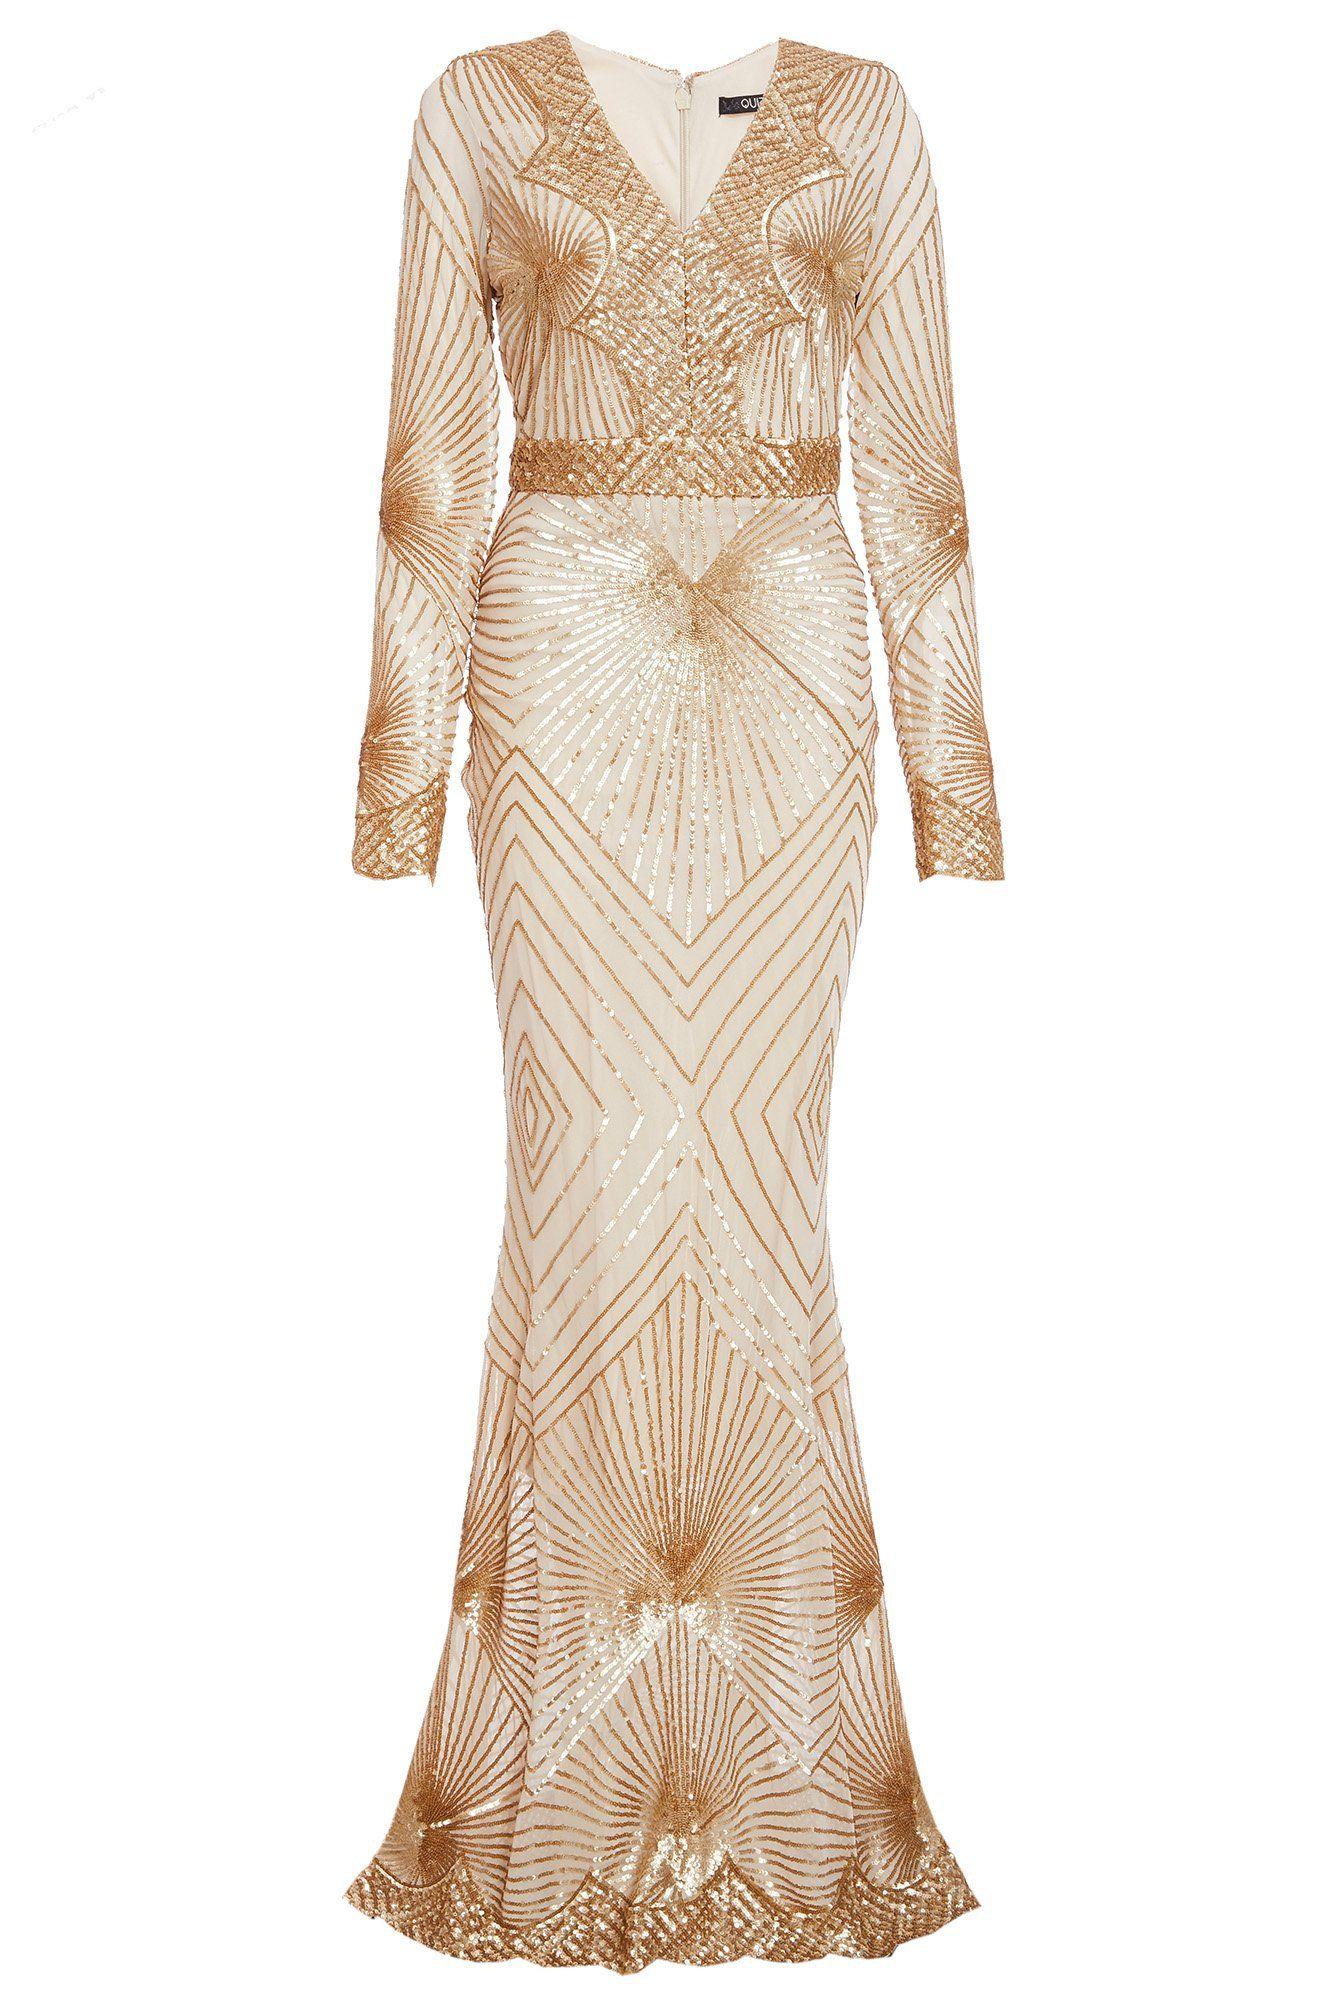 Gold Sequin Long Sleeve Fishtail Maxi Dress Quiz Clothing Gold Maxi Dress Long Sleeve Dress Formal Gold Long Sleeve Dress [ 2000 x 1333 Pixel ]